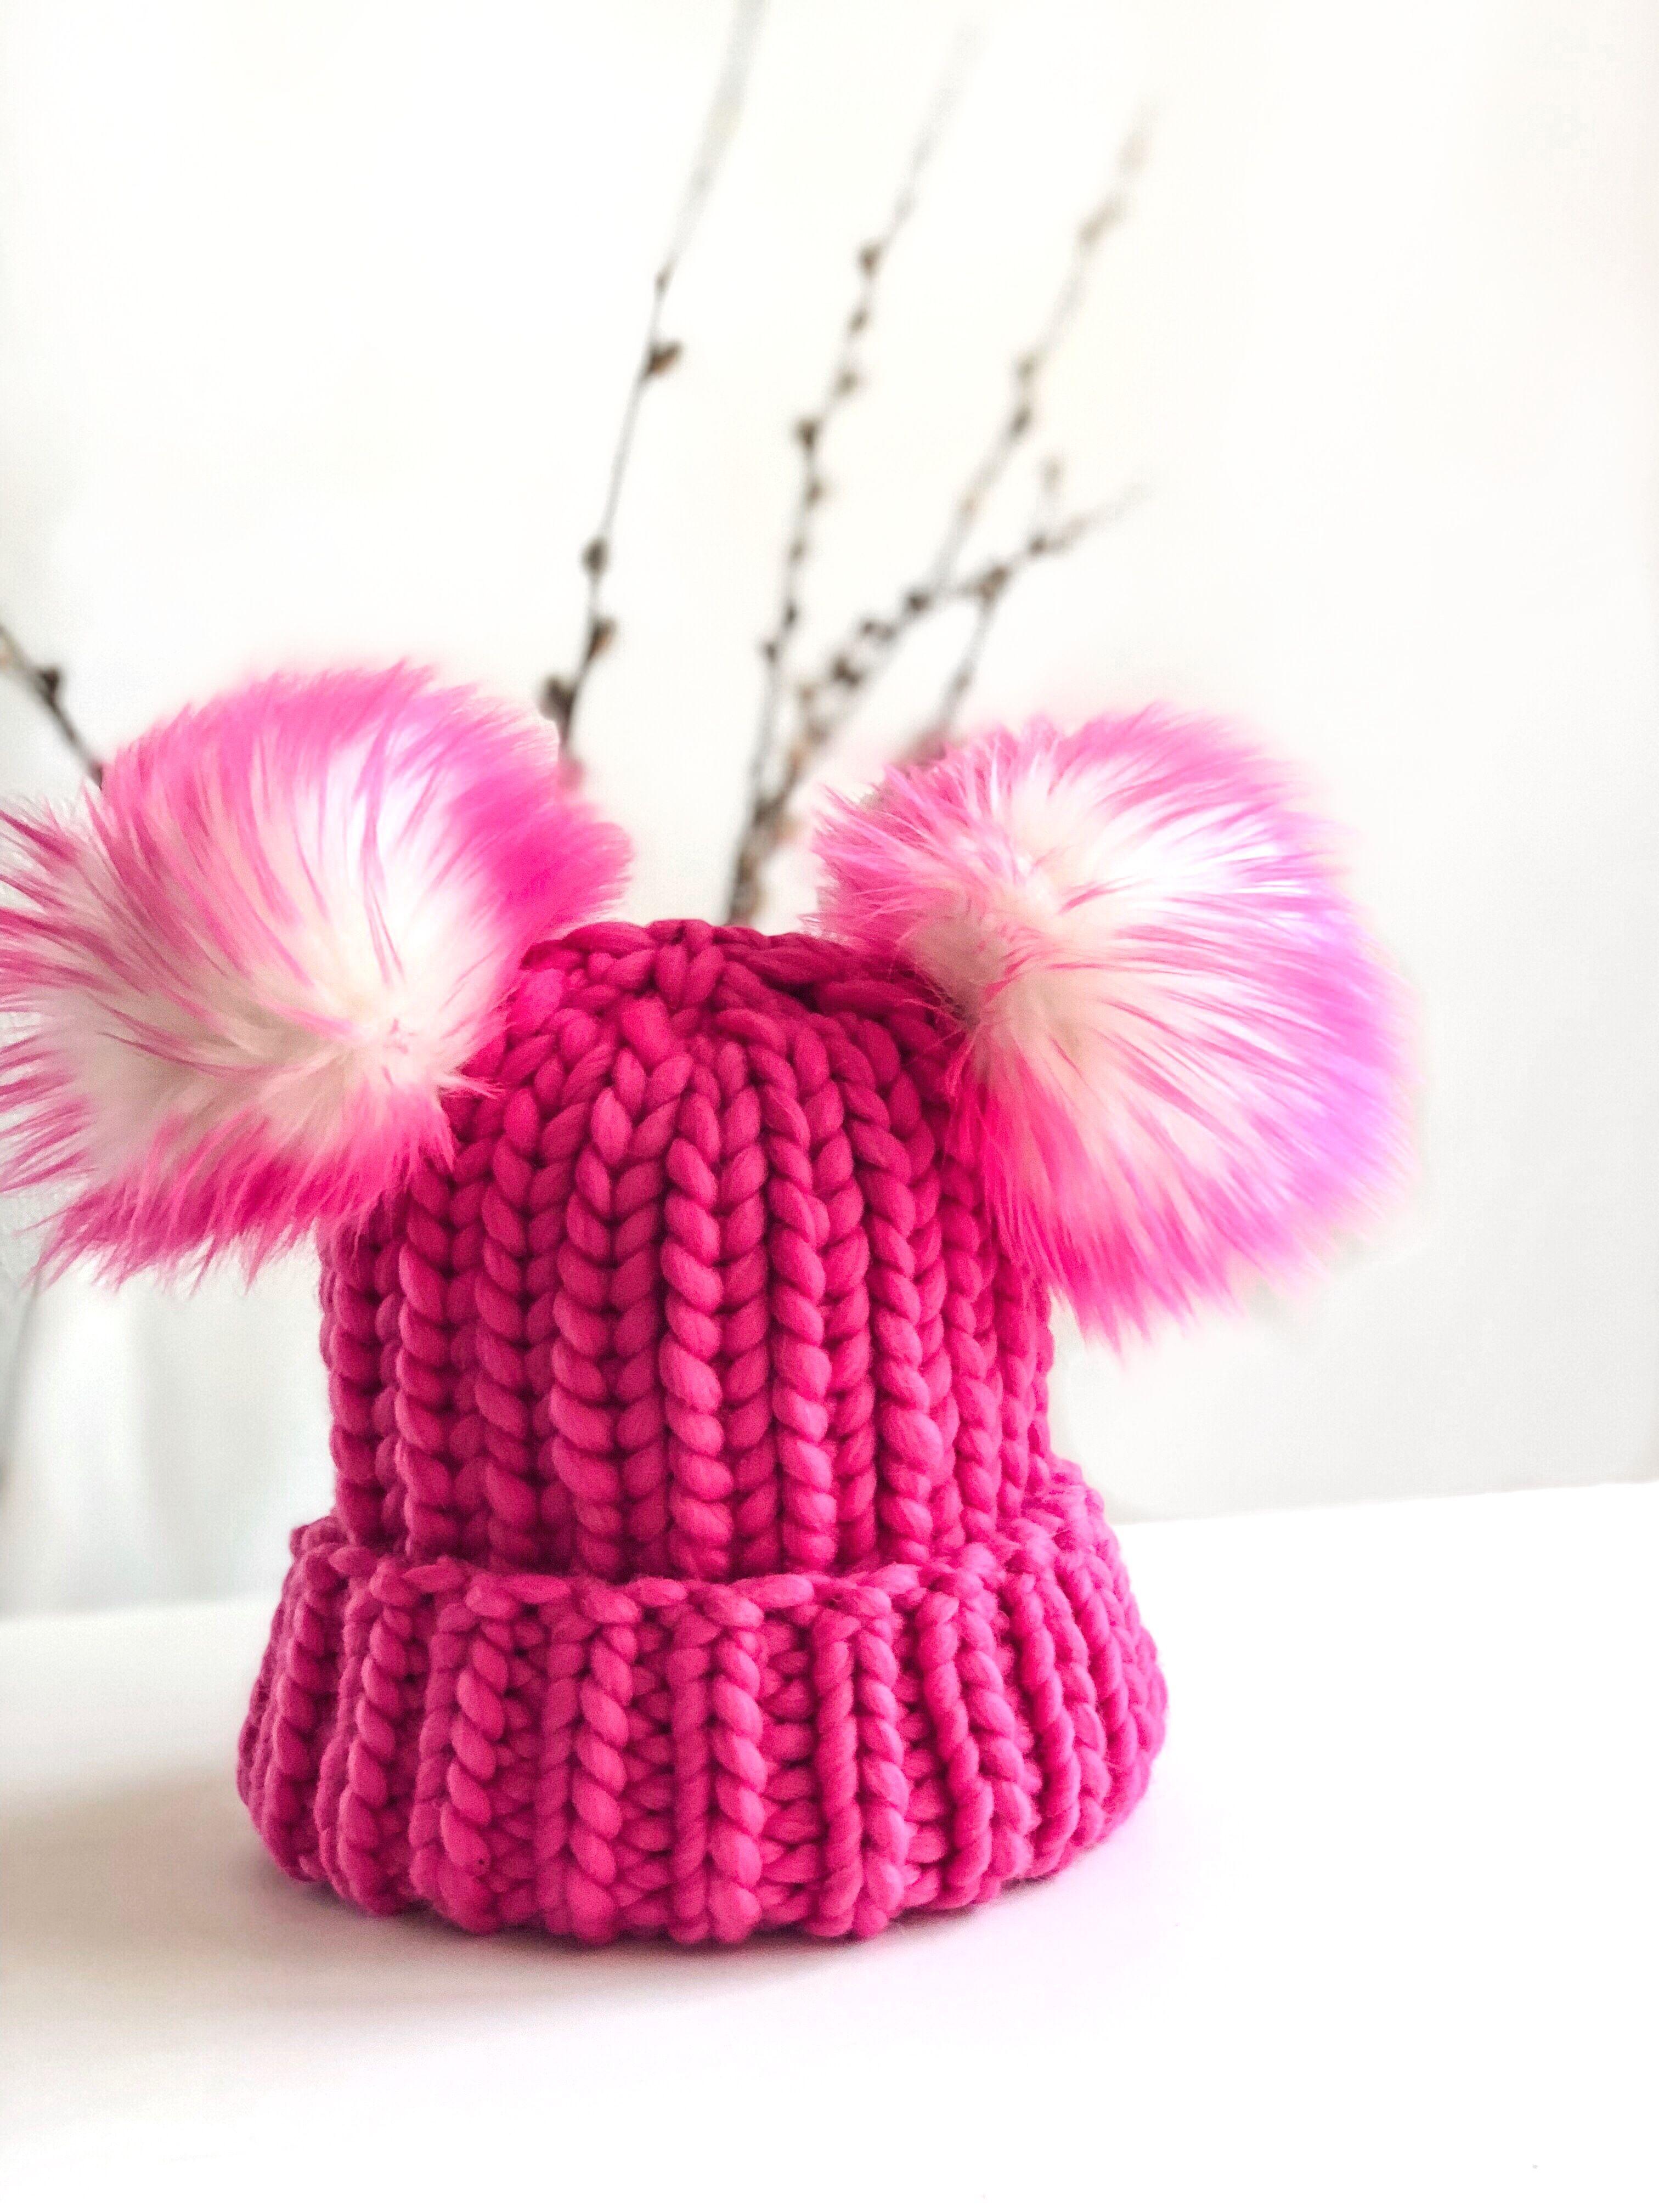 ffcc185678a  Nickichicki merino faux fur double pom-pom beanie. Hot pink winter hat.  Toddler girl style.